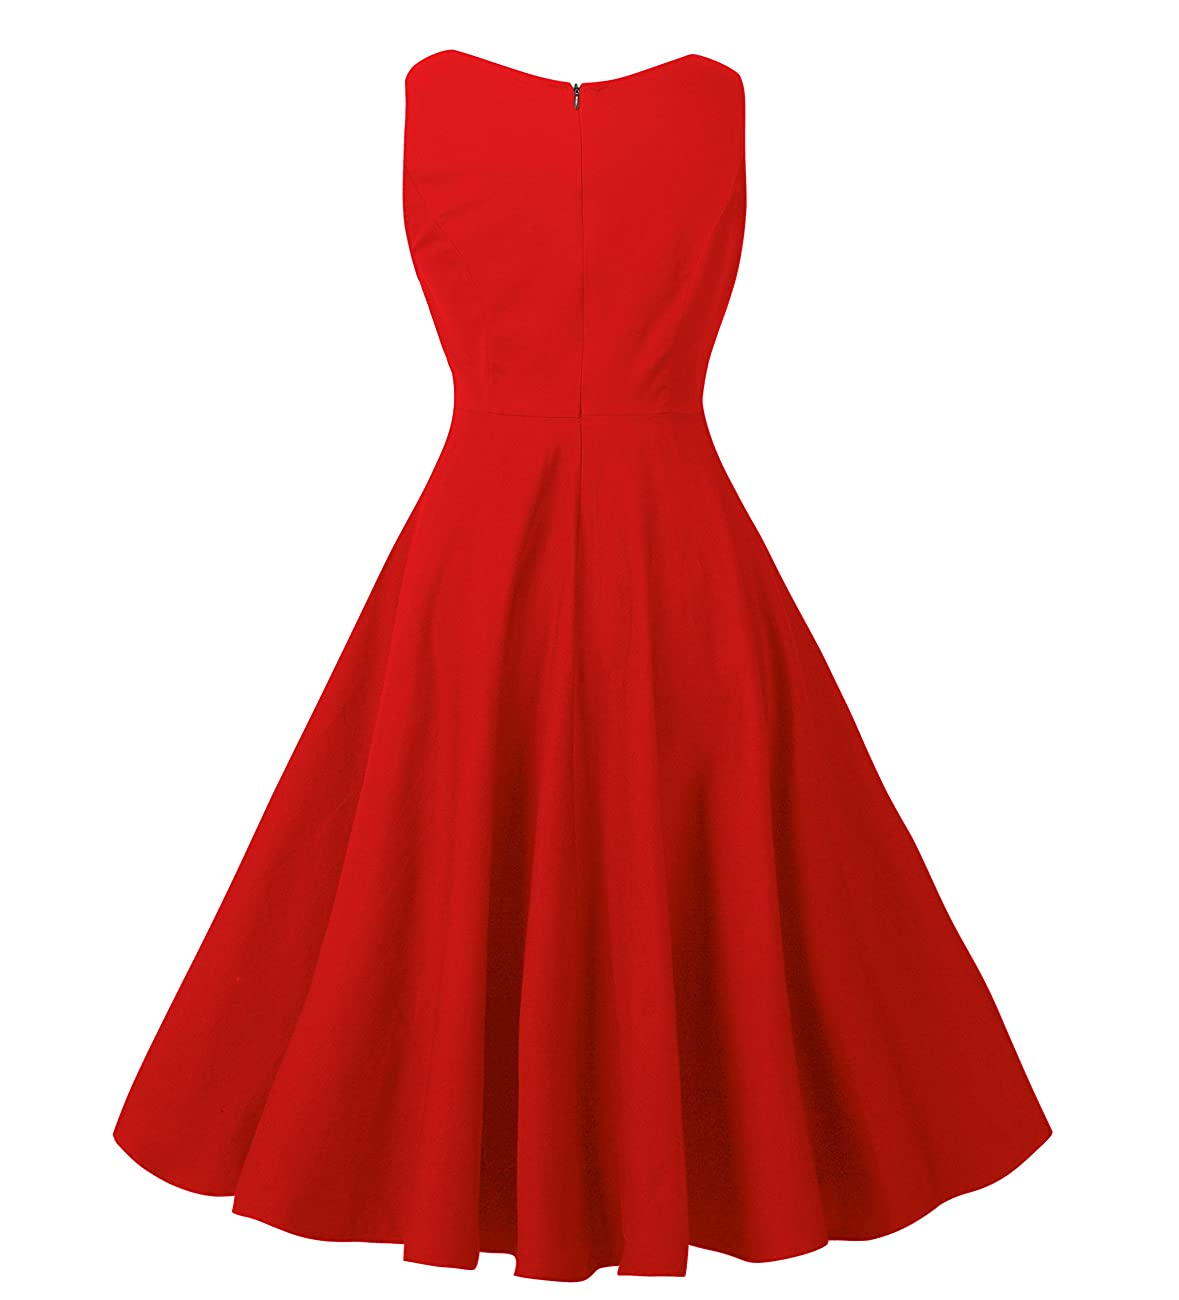 NINEWE Women's Classy Audrey Hepburn 1950s Vintage Rockabilly Swing Dress 2